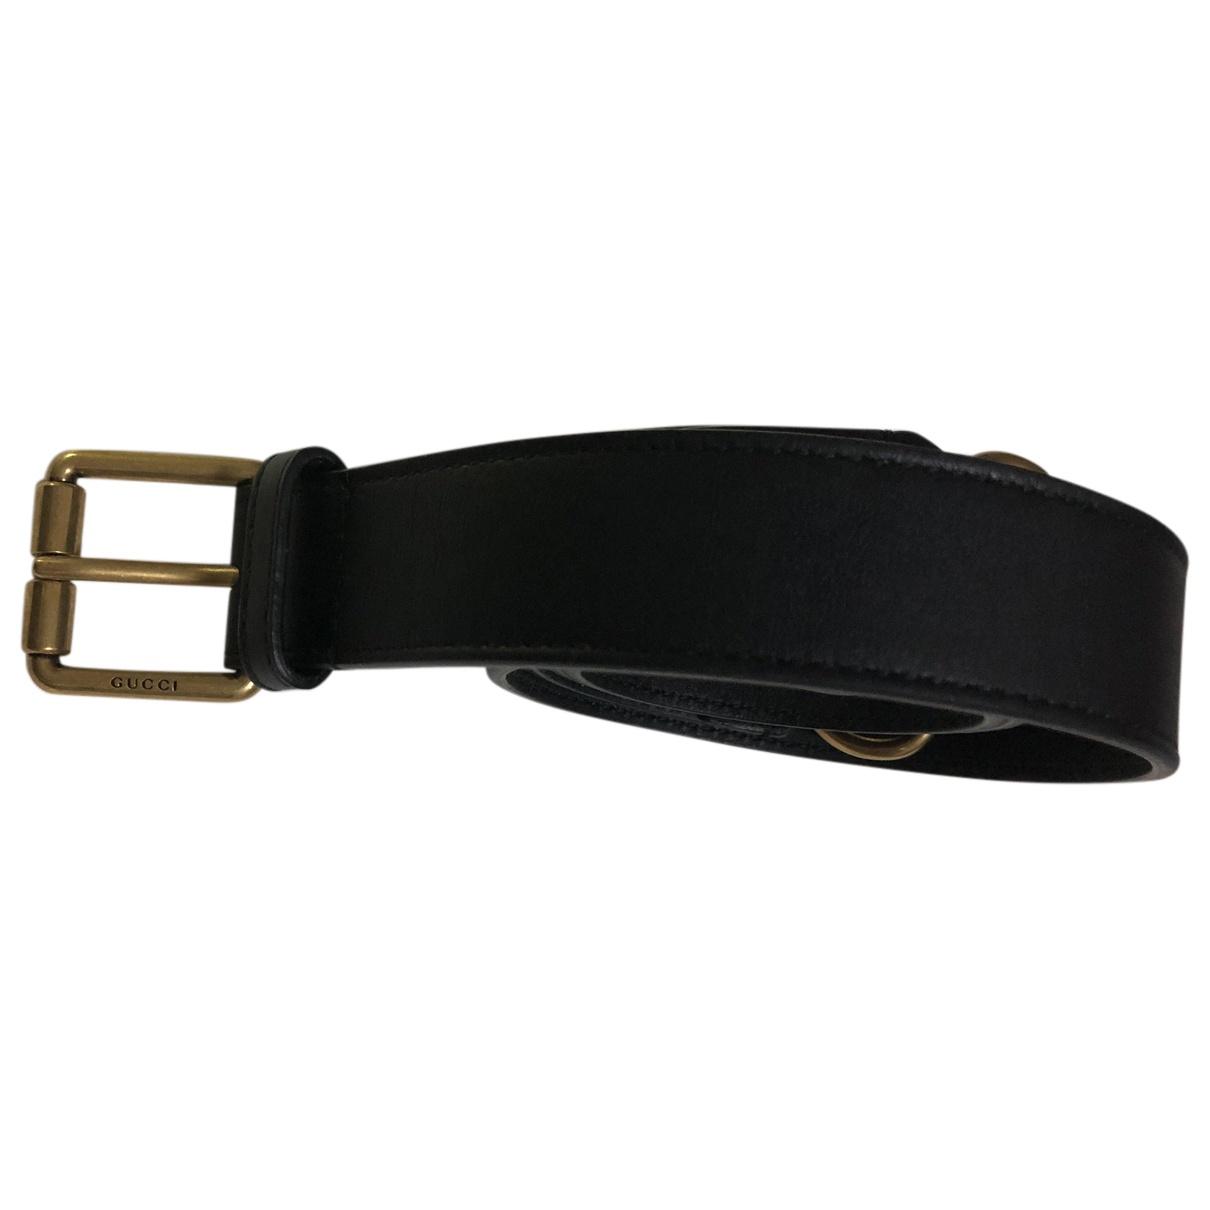 Gucci N Black Leather belt for Women 95 cm